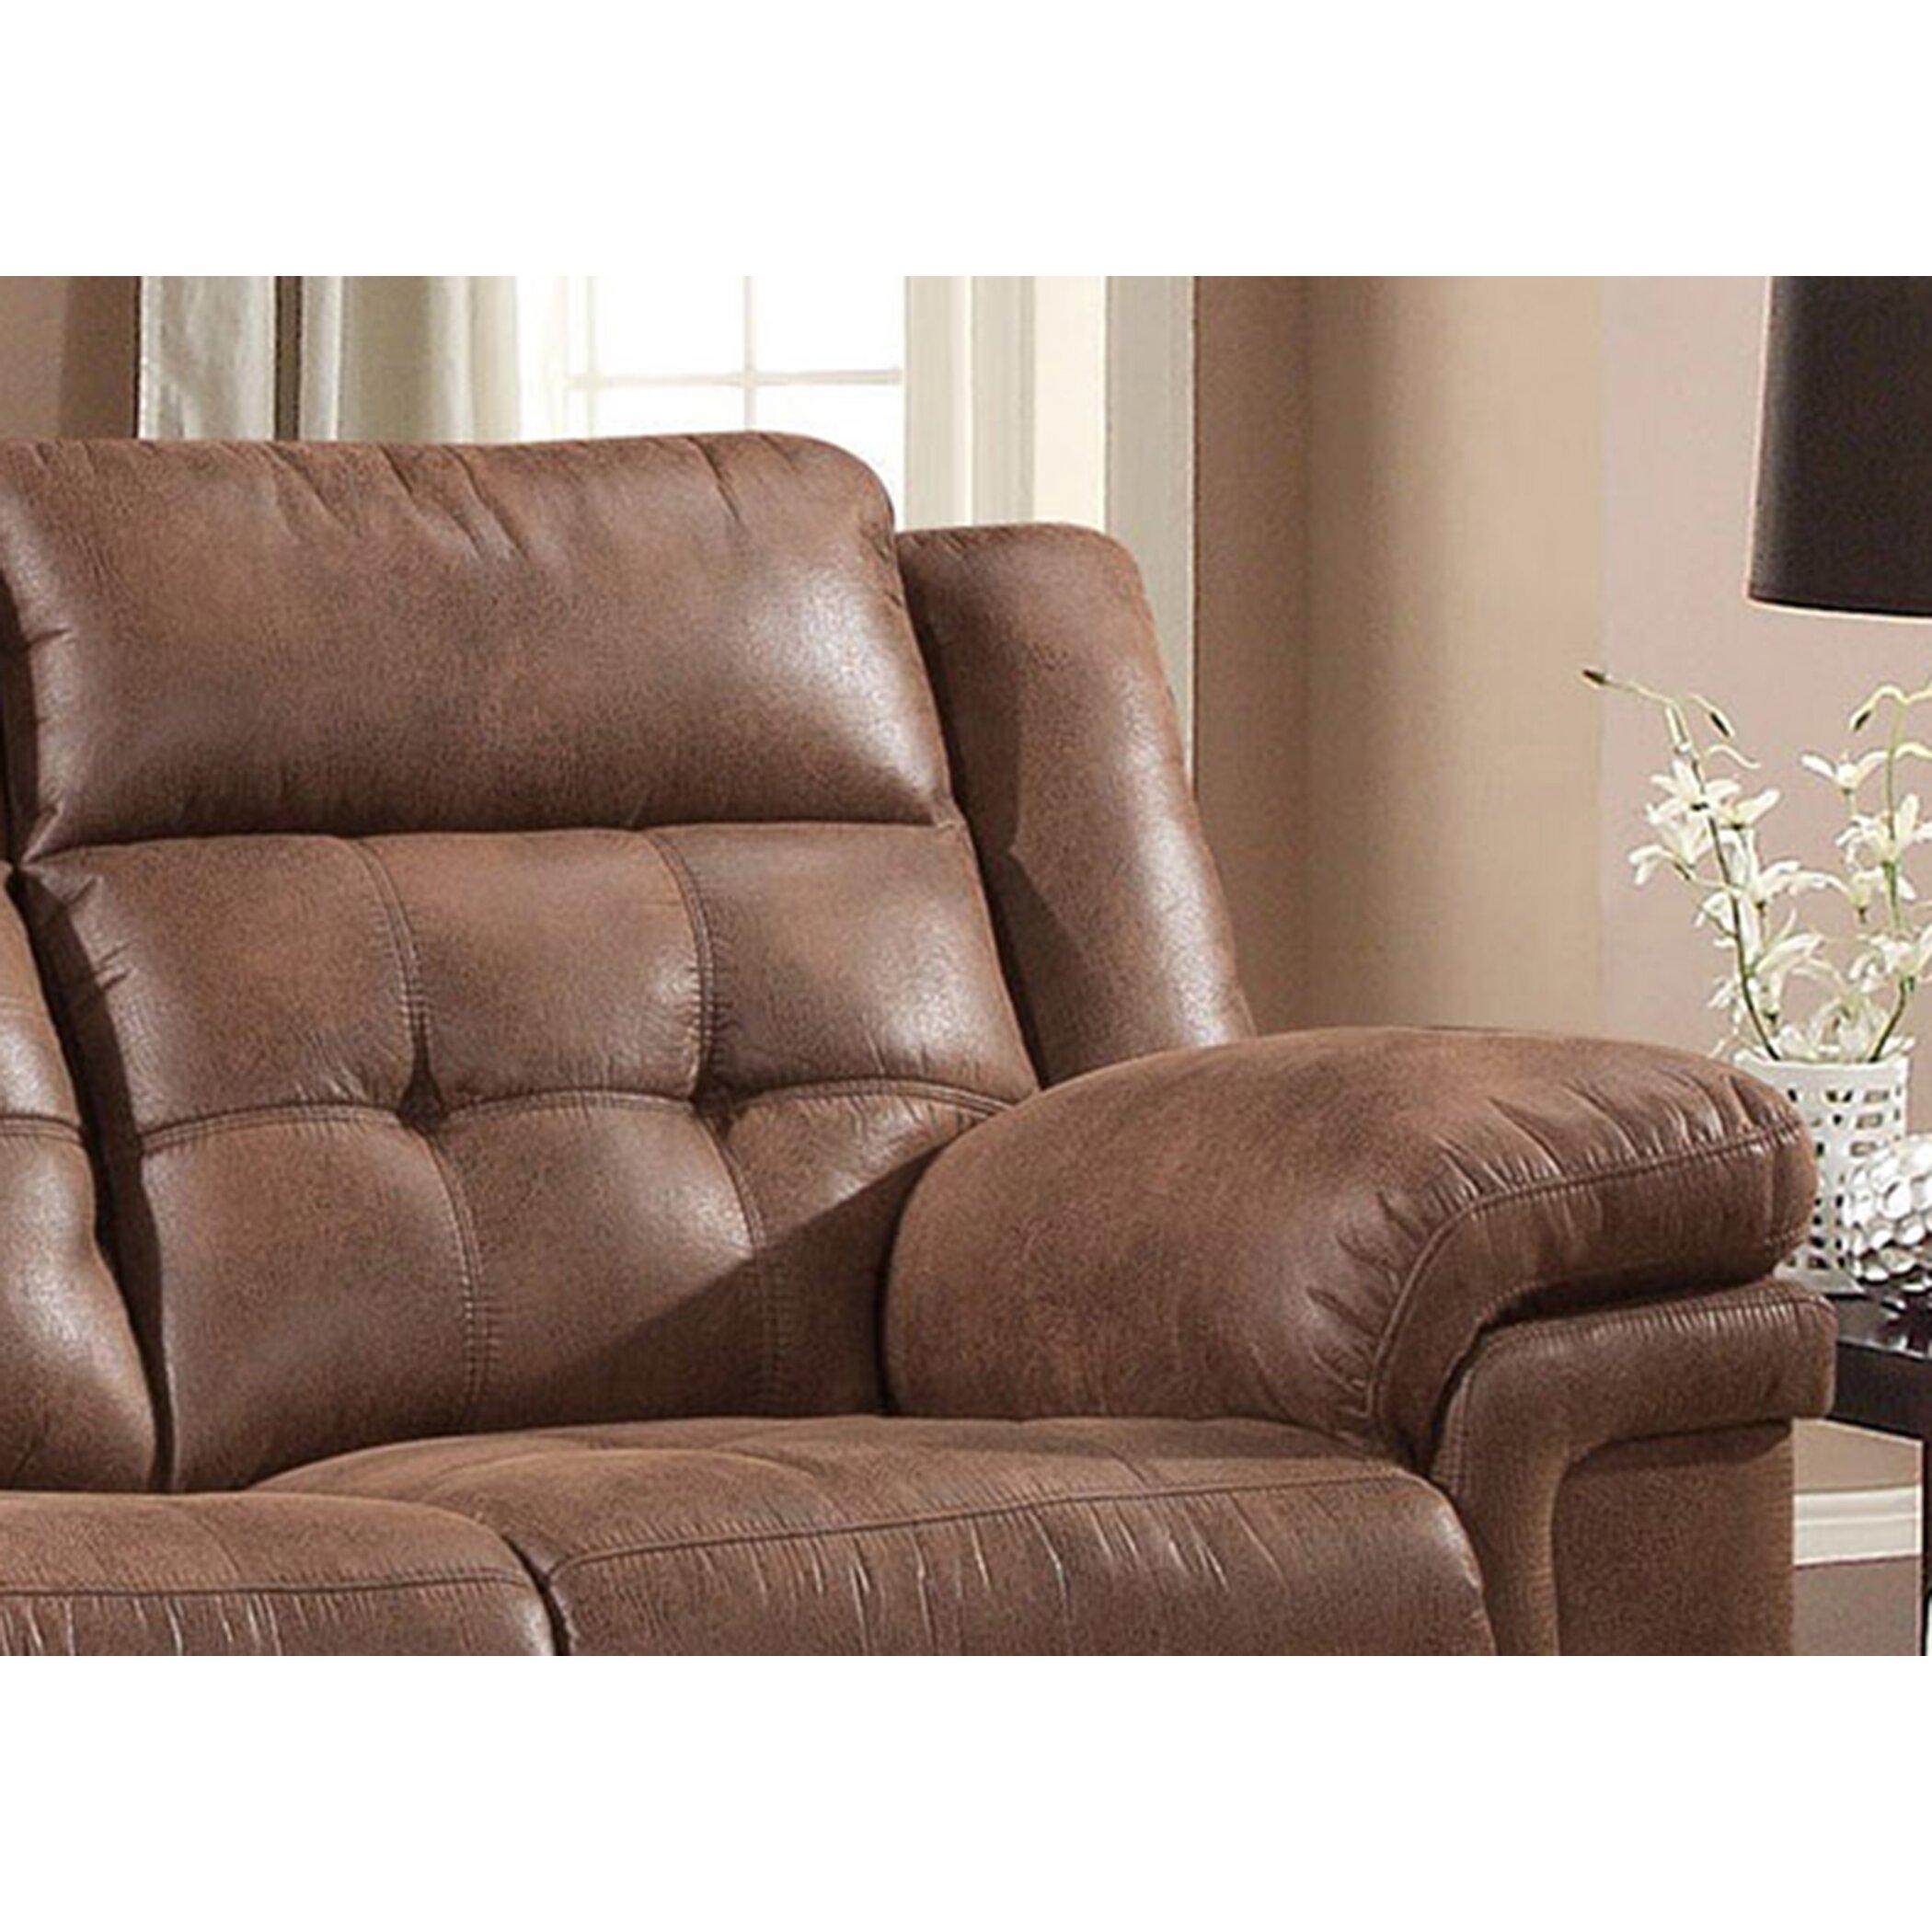 Ac pacific kingston 2 piece living room set reviews for Two piece living room set